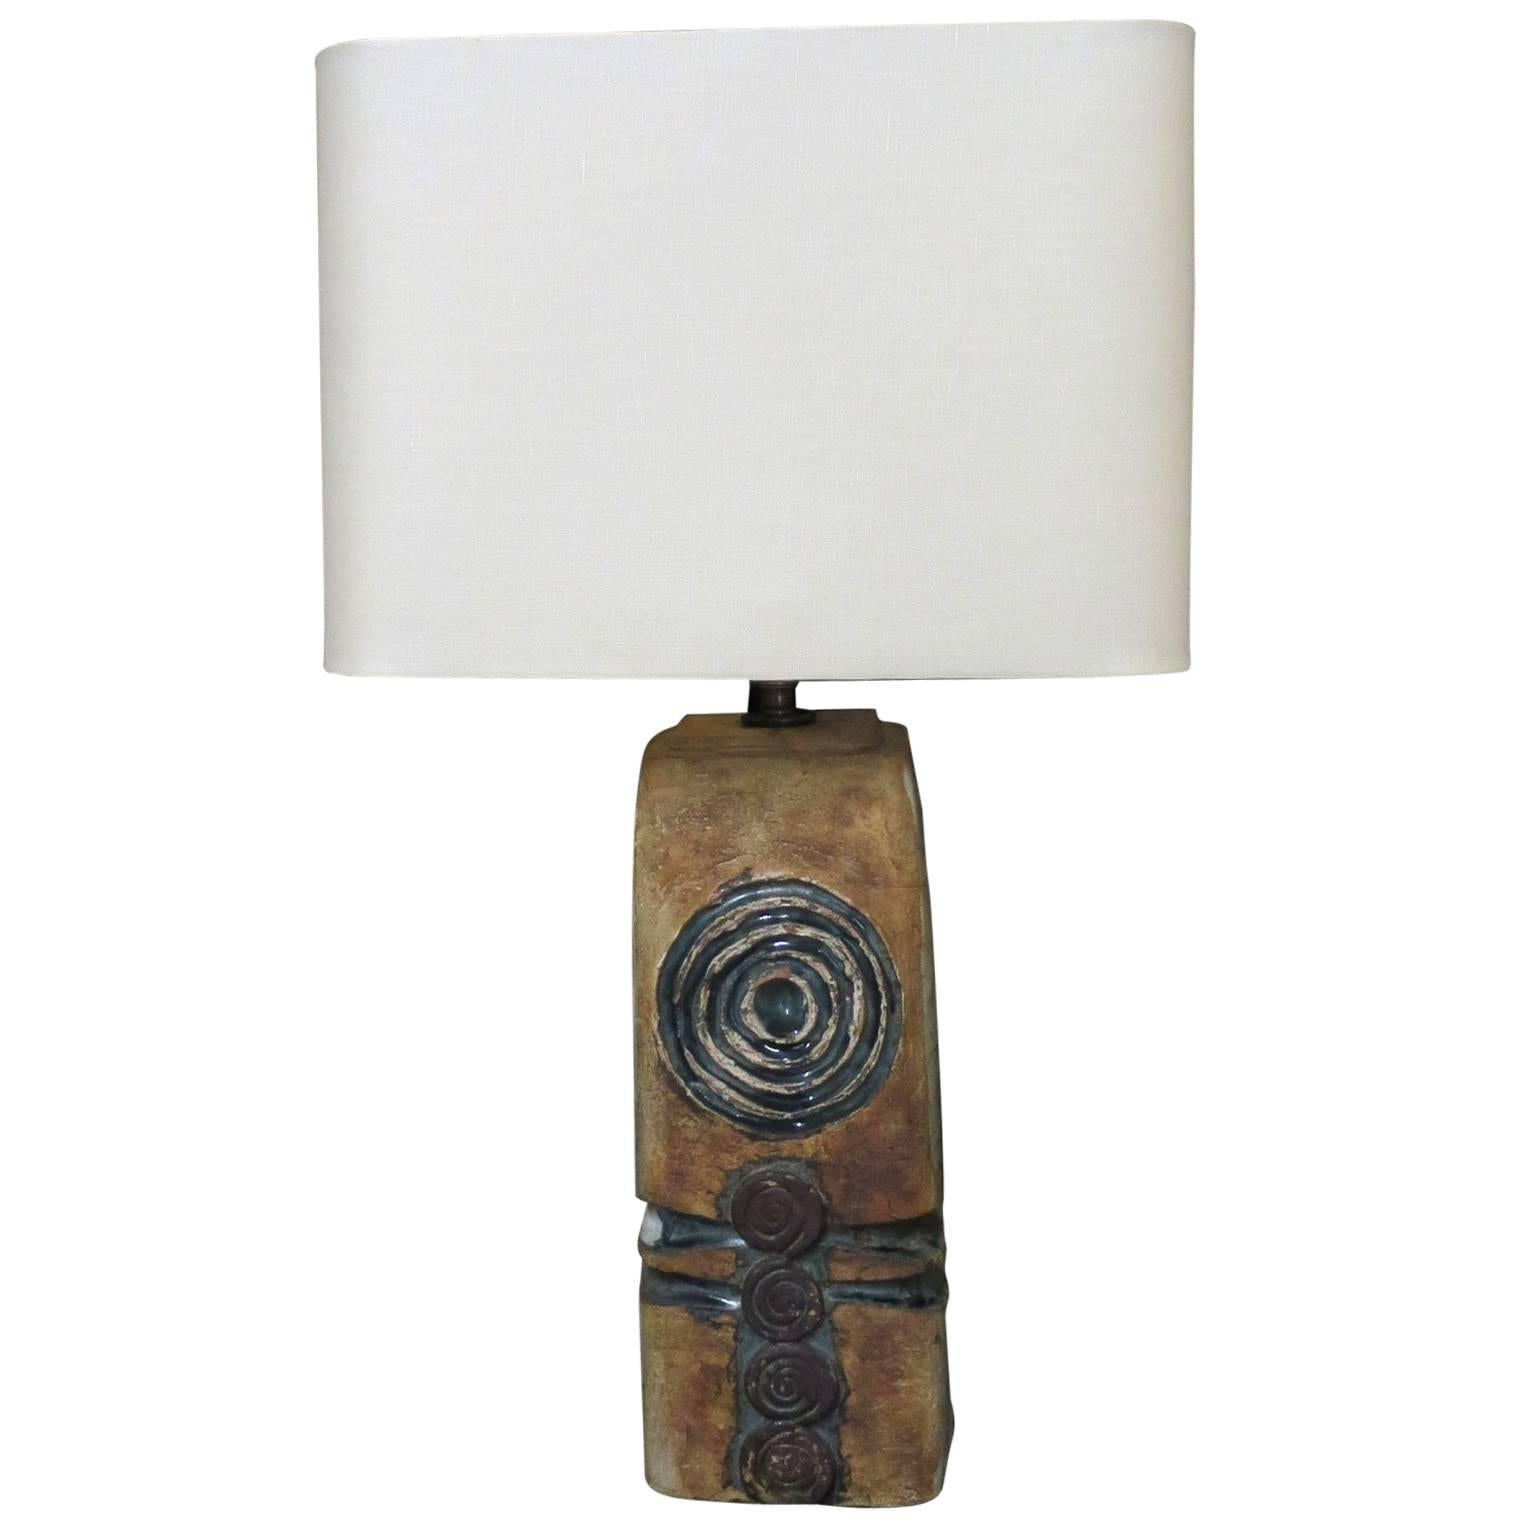 French Mid-Century, Sandstone Sculpture Unique Piece, Vallauris Table Lamp